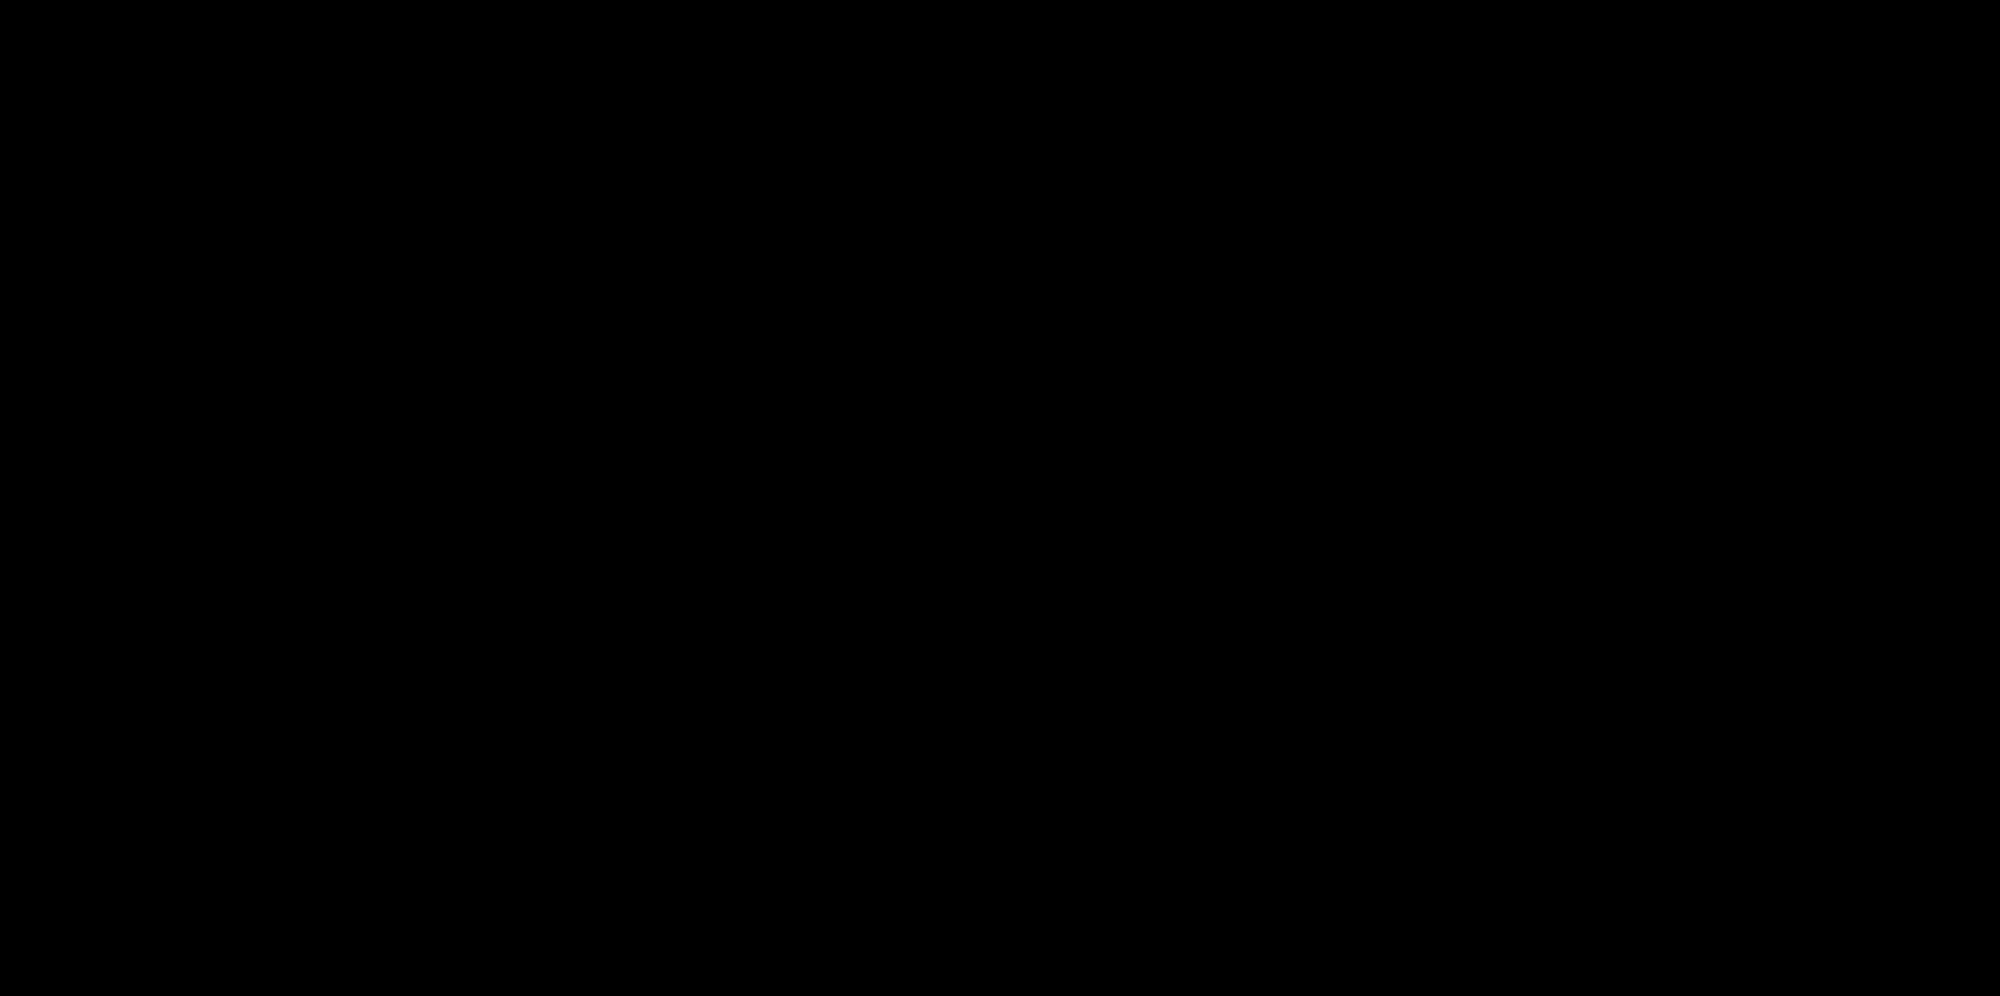 image black and white svg support basic #104376051